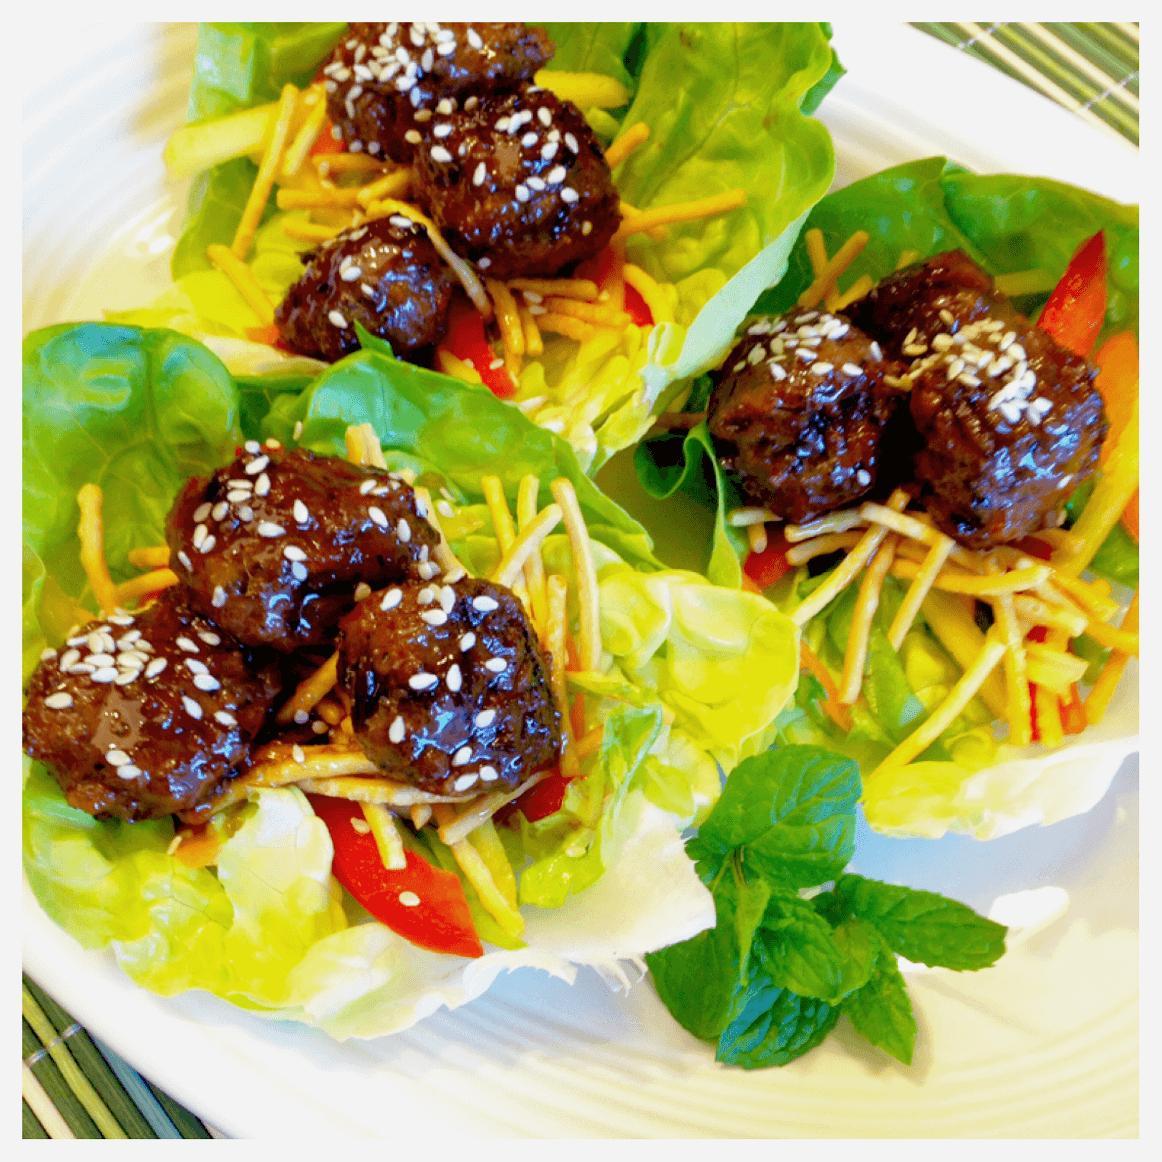 For seven Asian meatballs on snow peas picks